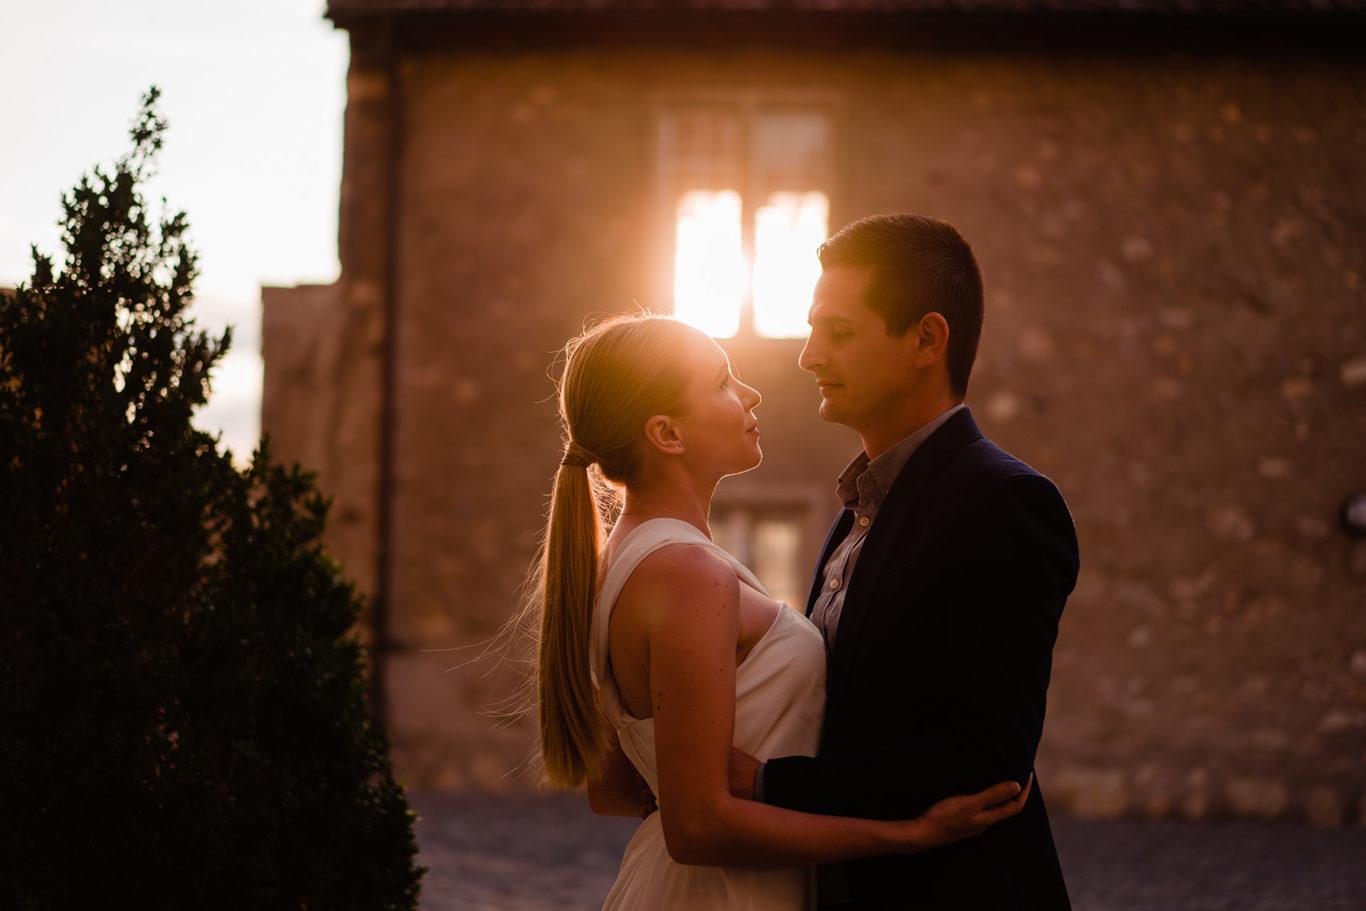 Sedinta foto dupa nunta in Elvetia - Alexandra & Ovidiu